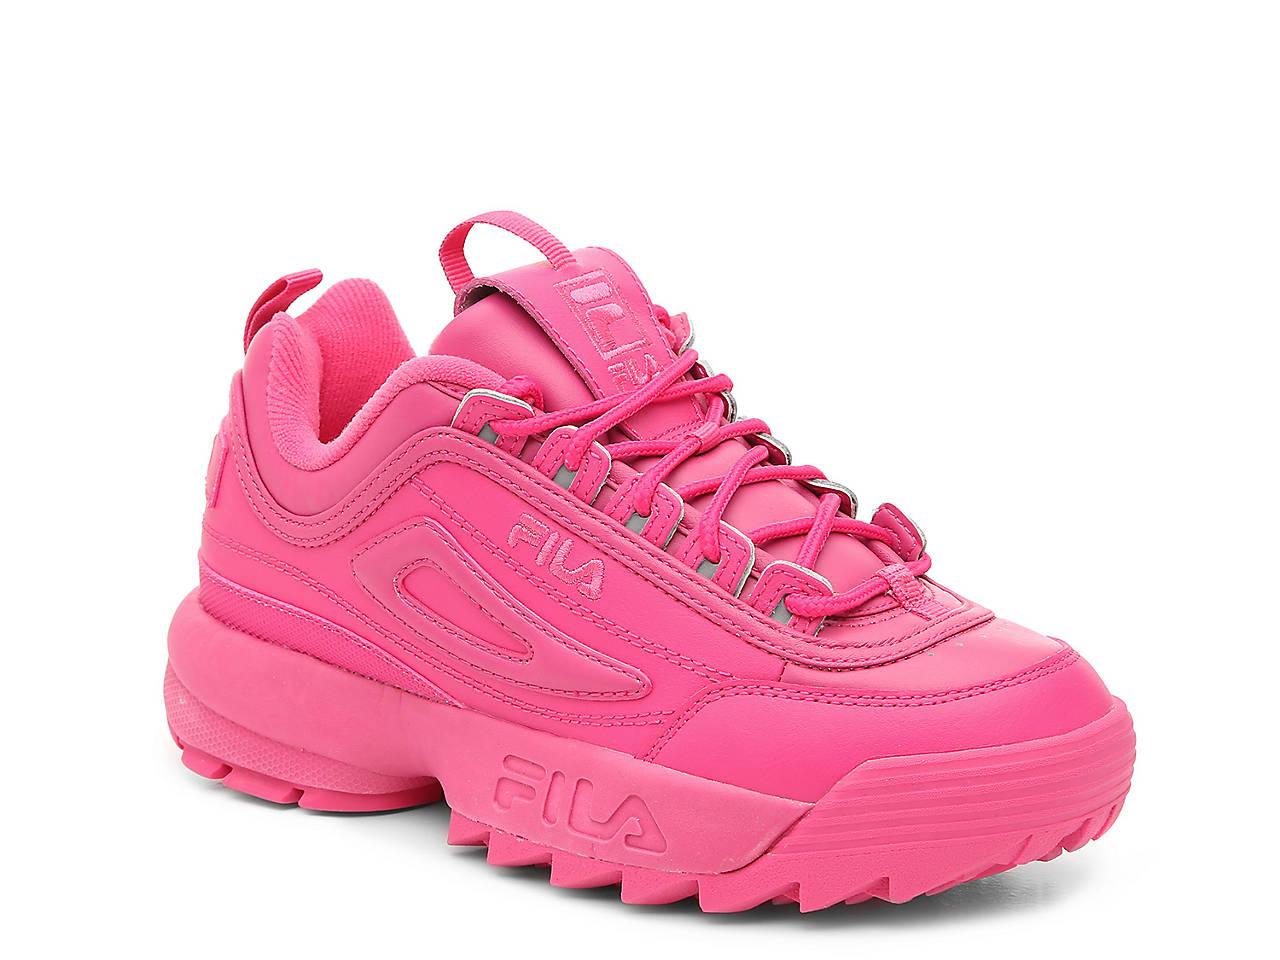 08b66bd5ffb Fila Disruptor II Premium Sneaker - Women s Women s Shoes